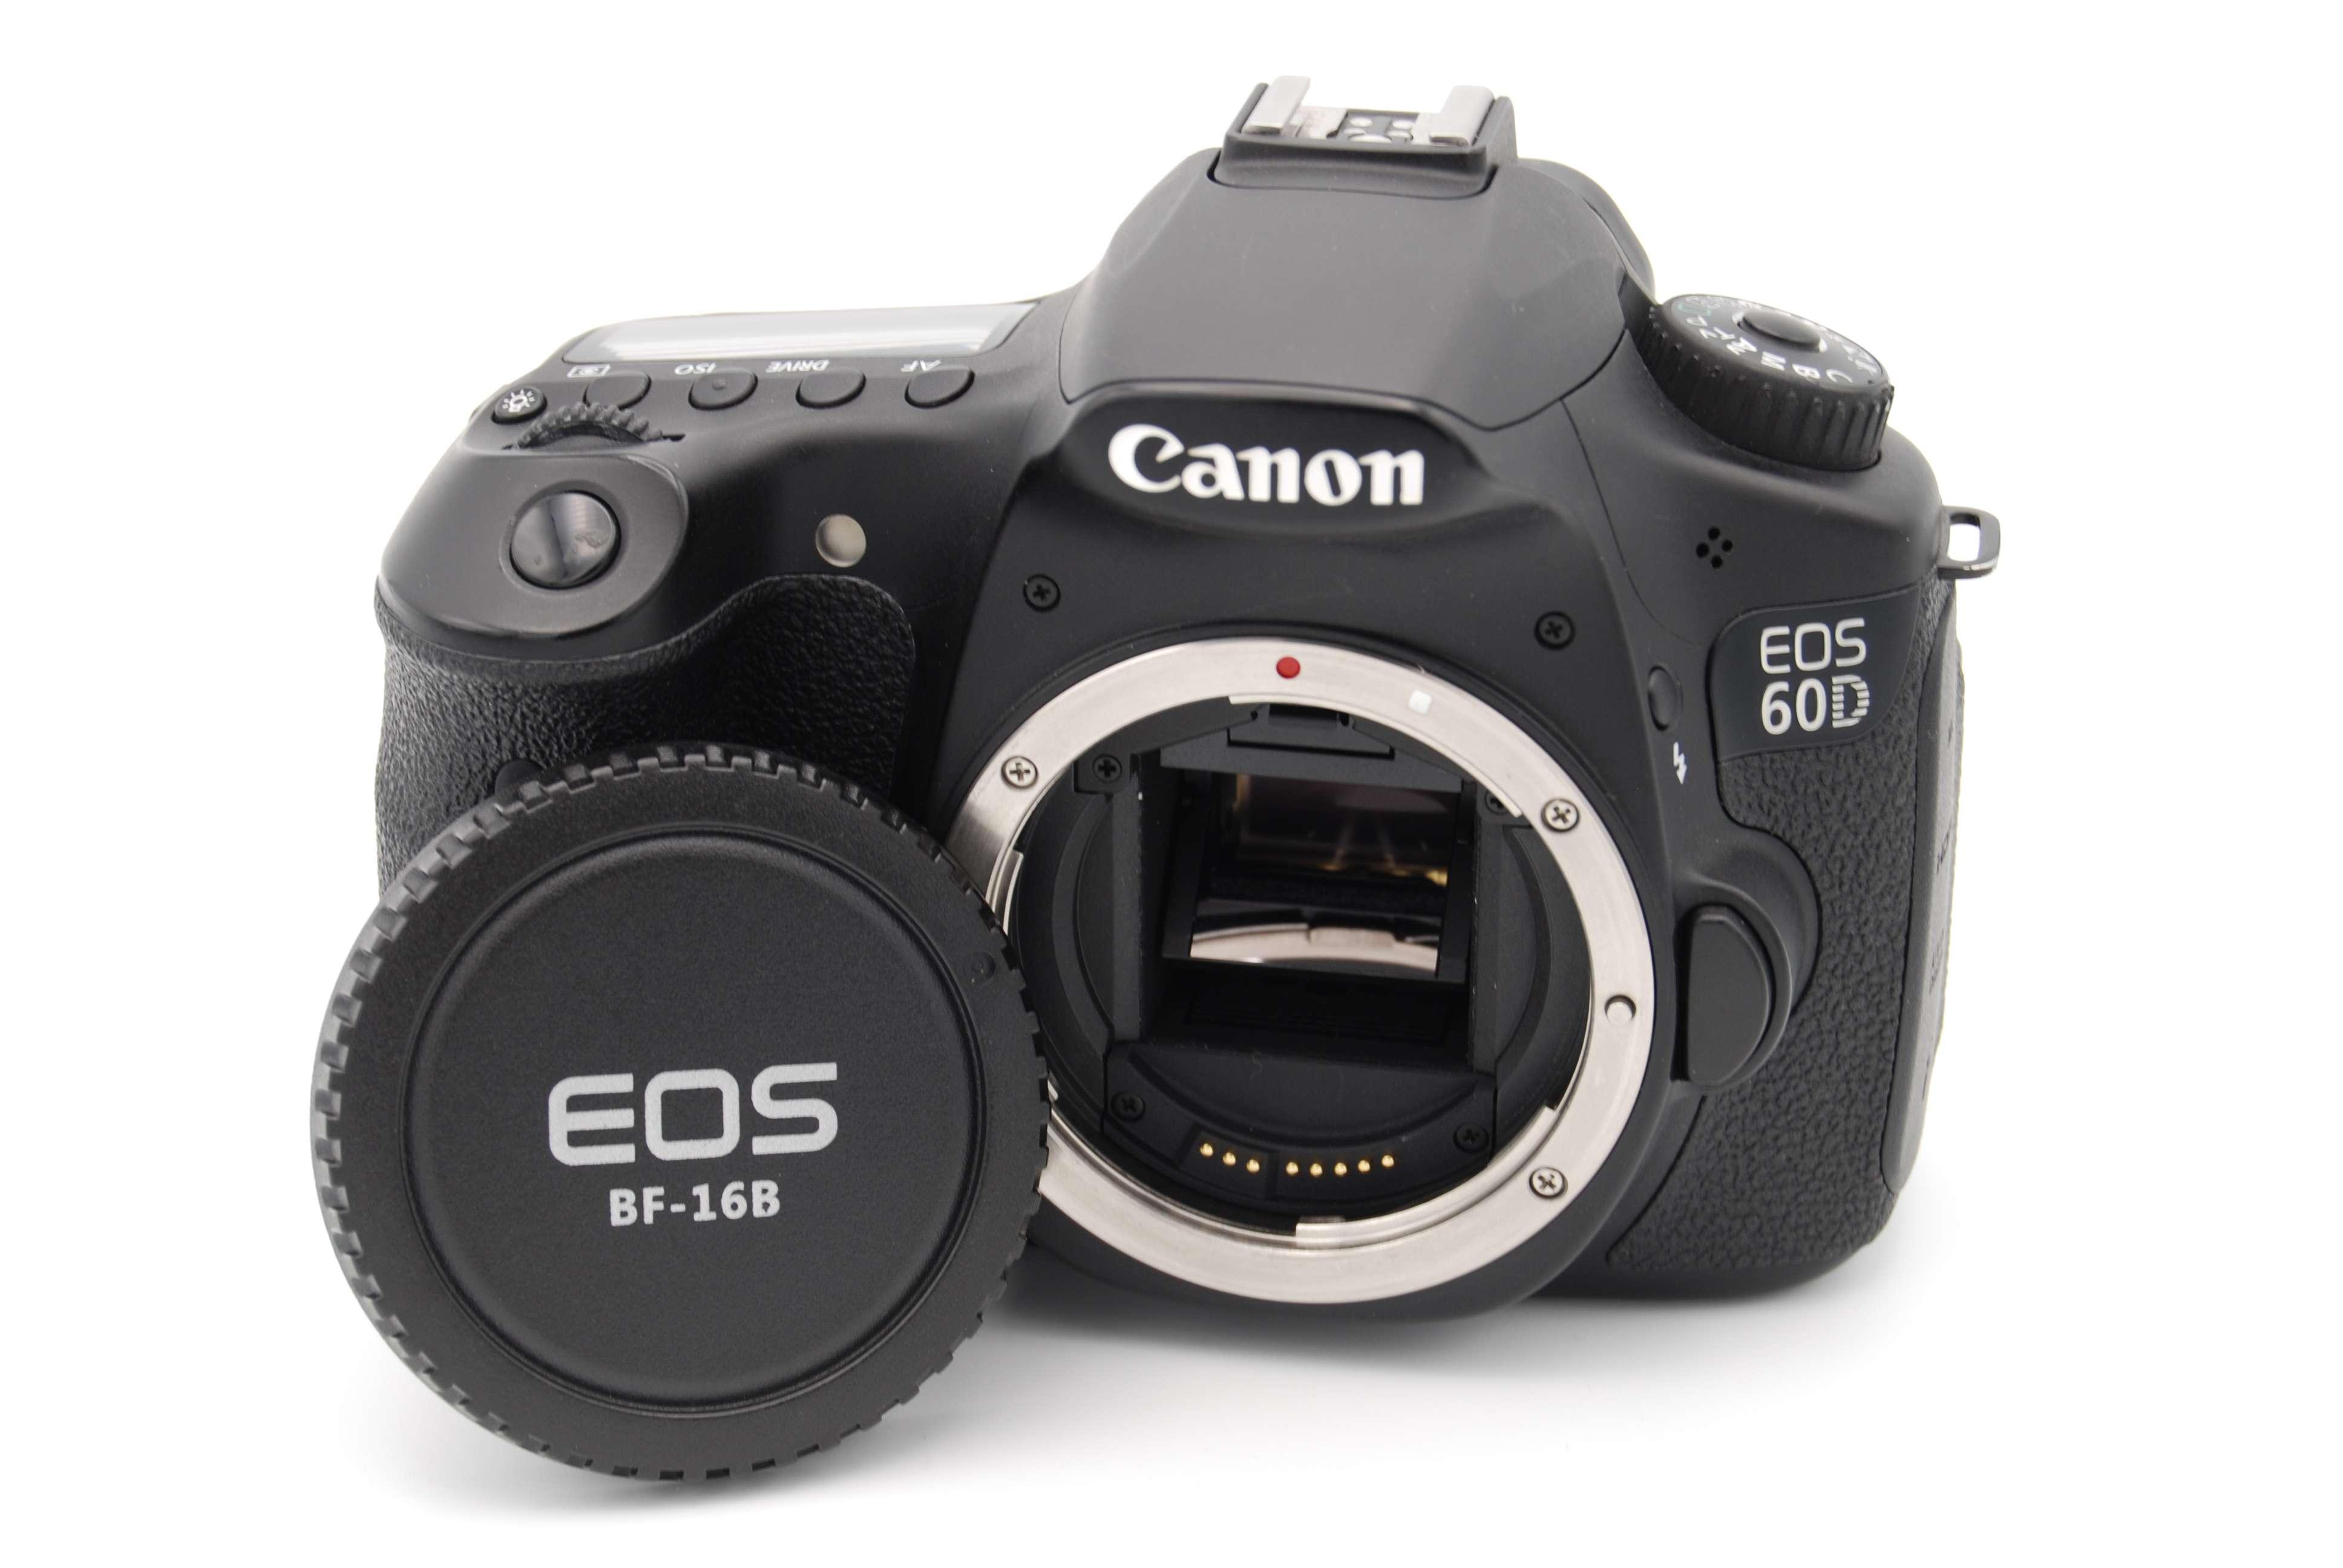 canon eos 60d 18 0 mp digital slr camera black body only 13803129175 ebay. Black Bedroom Furniture Sets. Home Design Ideas